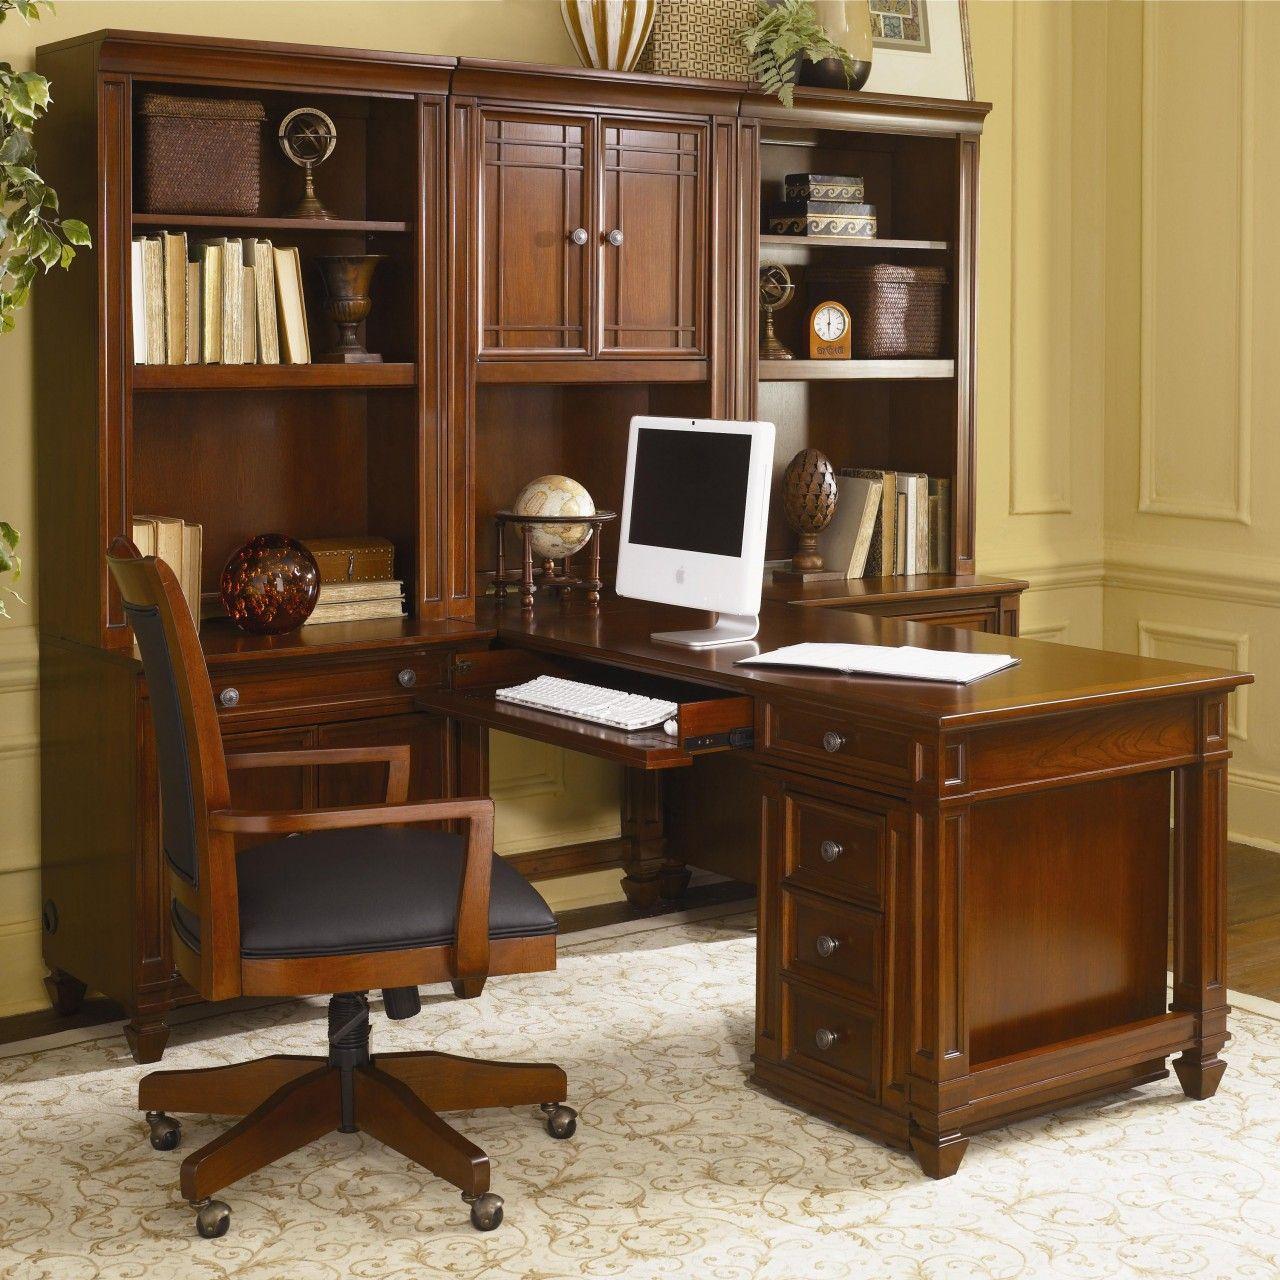 Lovely Wynwood Artisan 7pc Modular Desk Wall Unit In Auburn Cherry